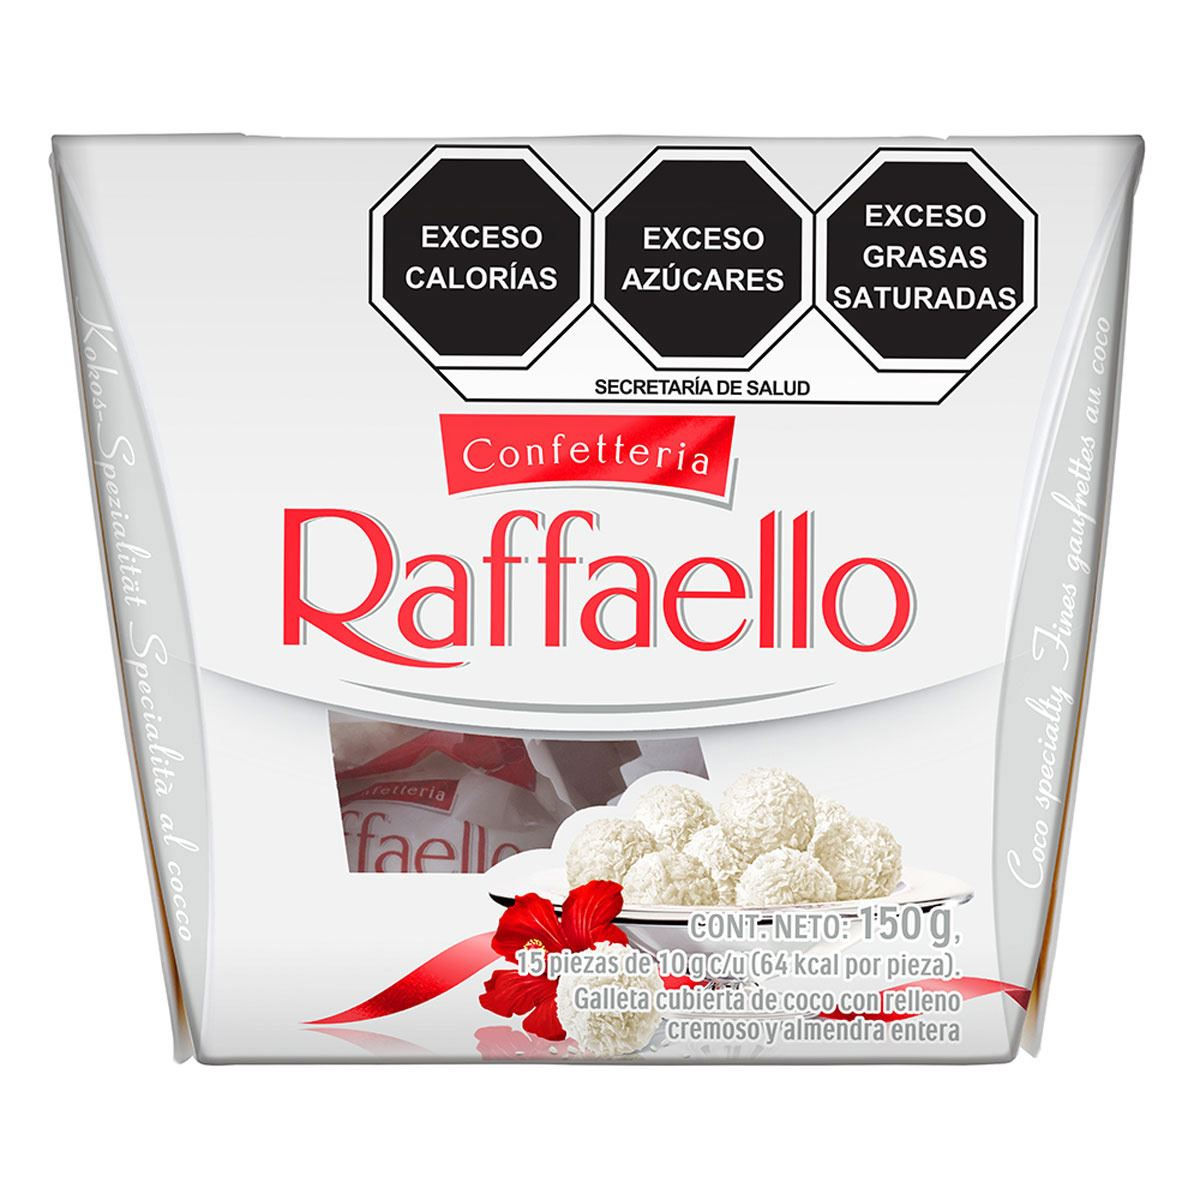 Caja de Chocolates Raffaello 150g